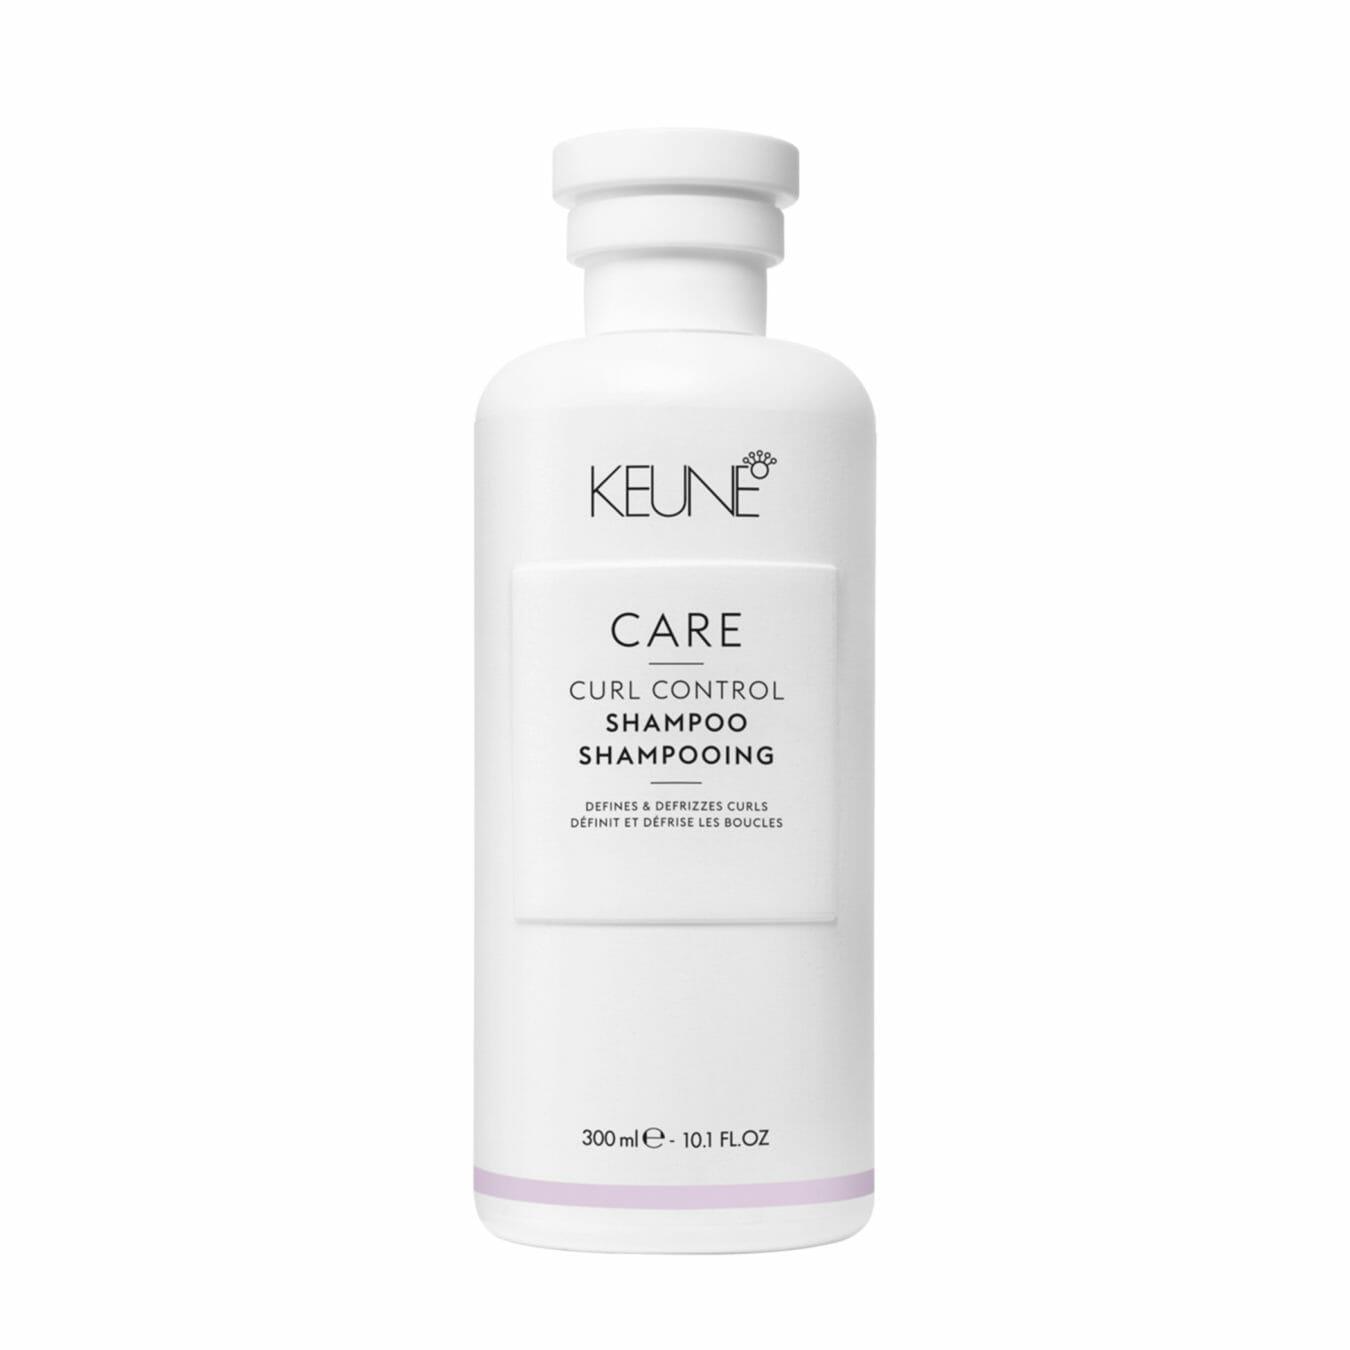 Koop Keune Care Curl Control Shampoo 300ml